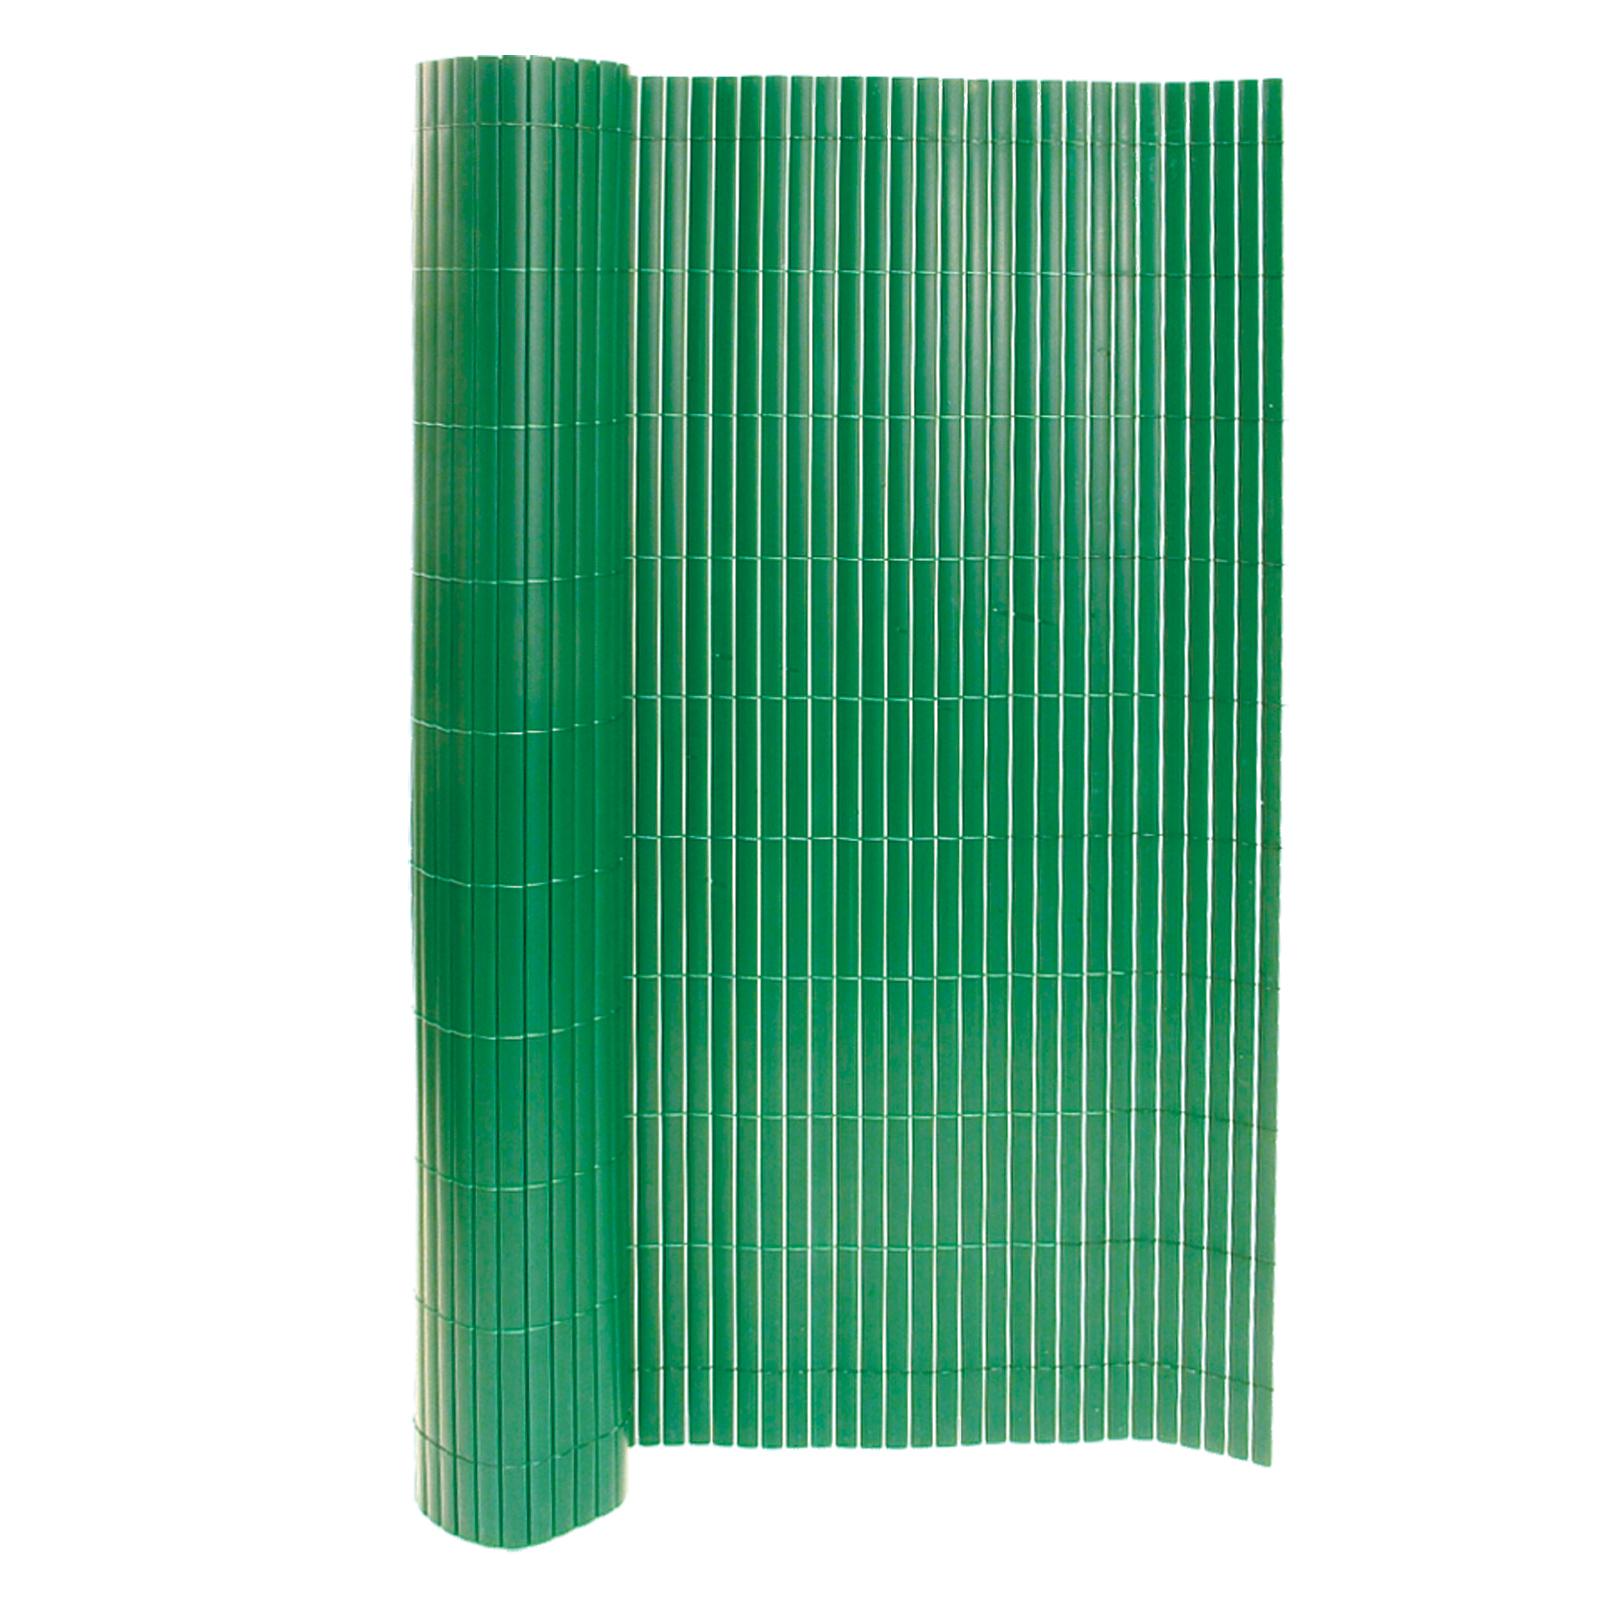 Pvc garden fence plastic panel screen double faced green 3m long pvc garden fence plastic panel screen double faced green 3m long 1m tall baanklon Gallery